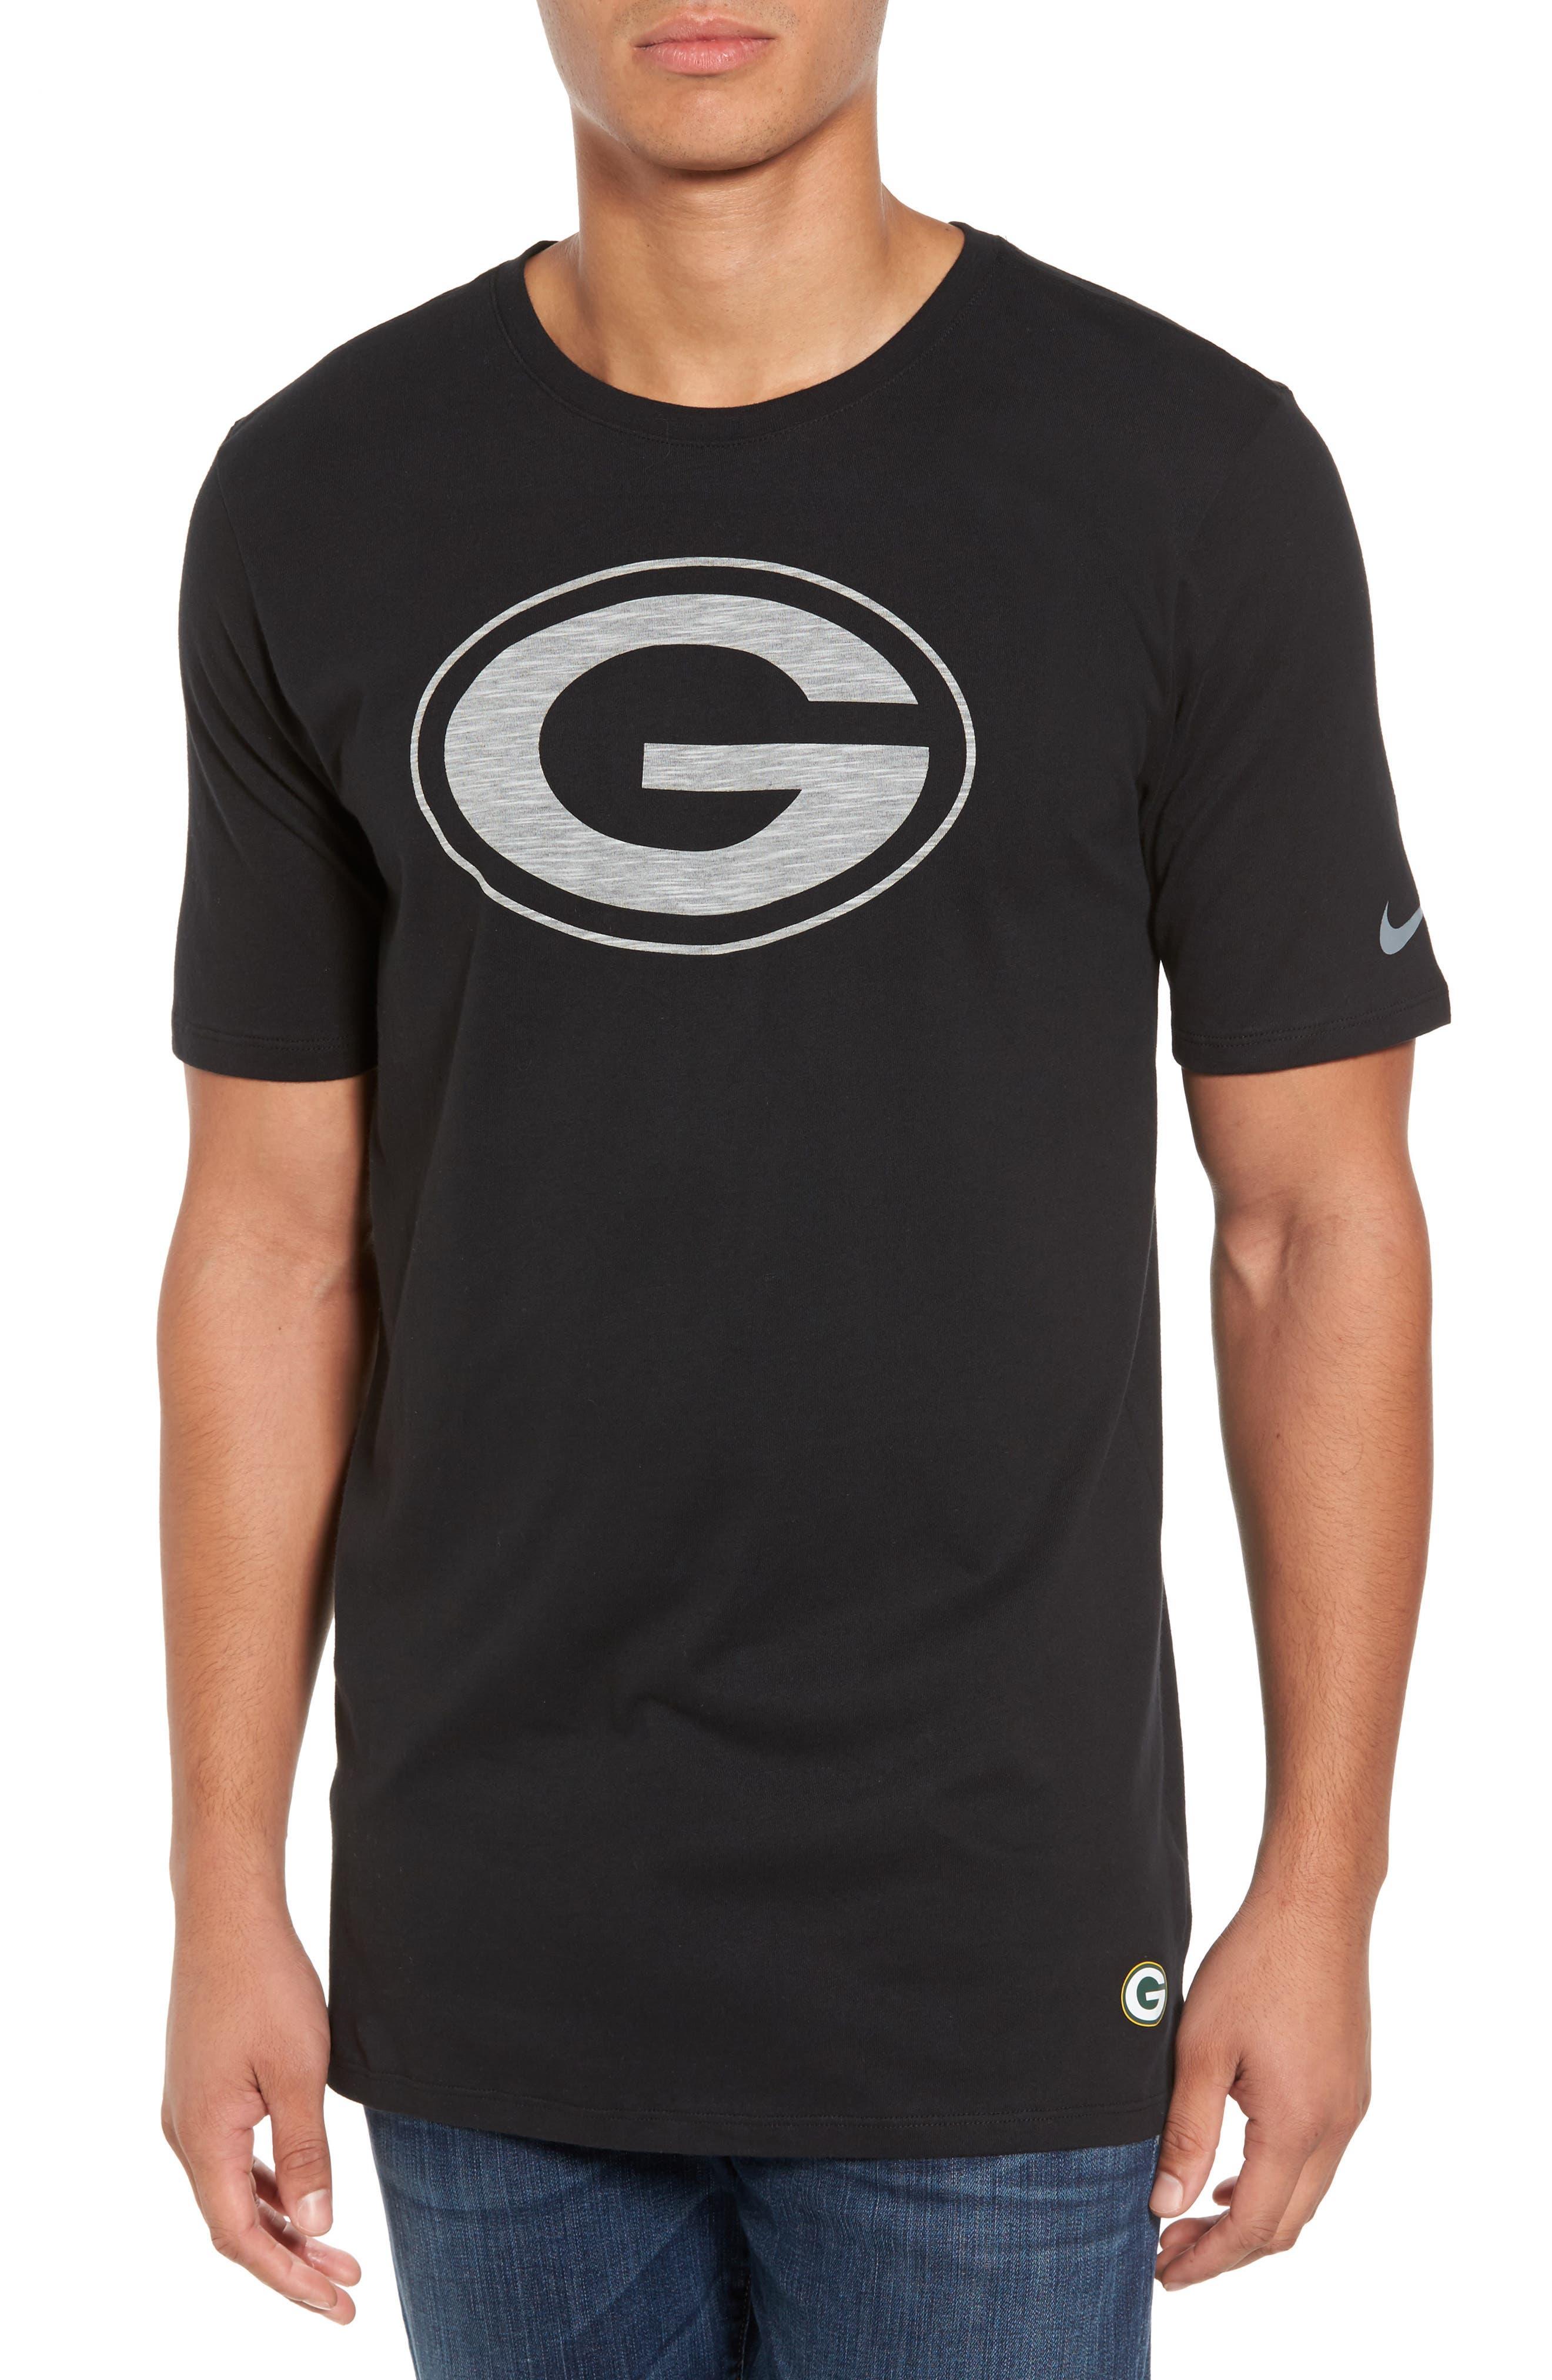 Nike NFL Team Graphic T-Shirt